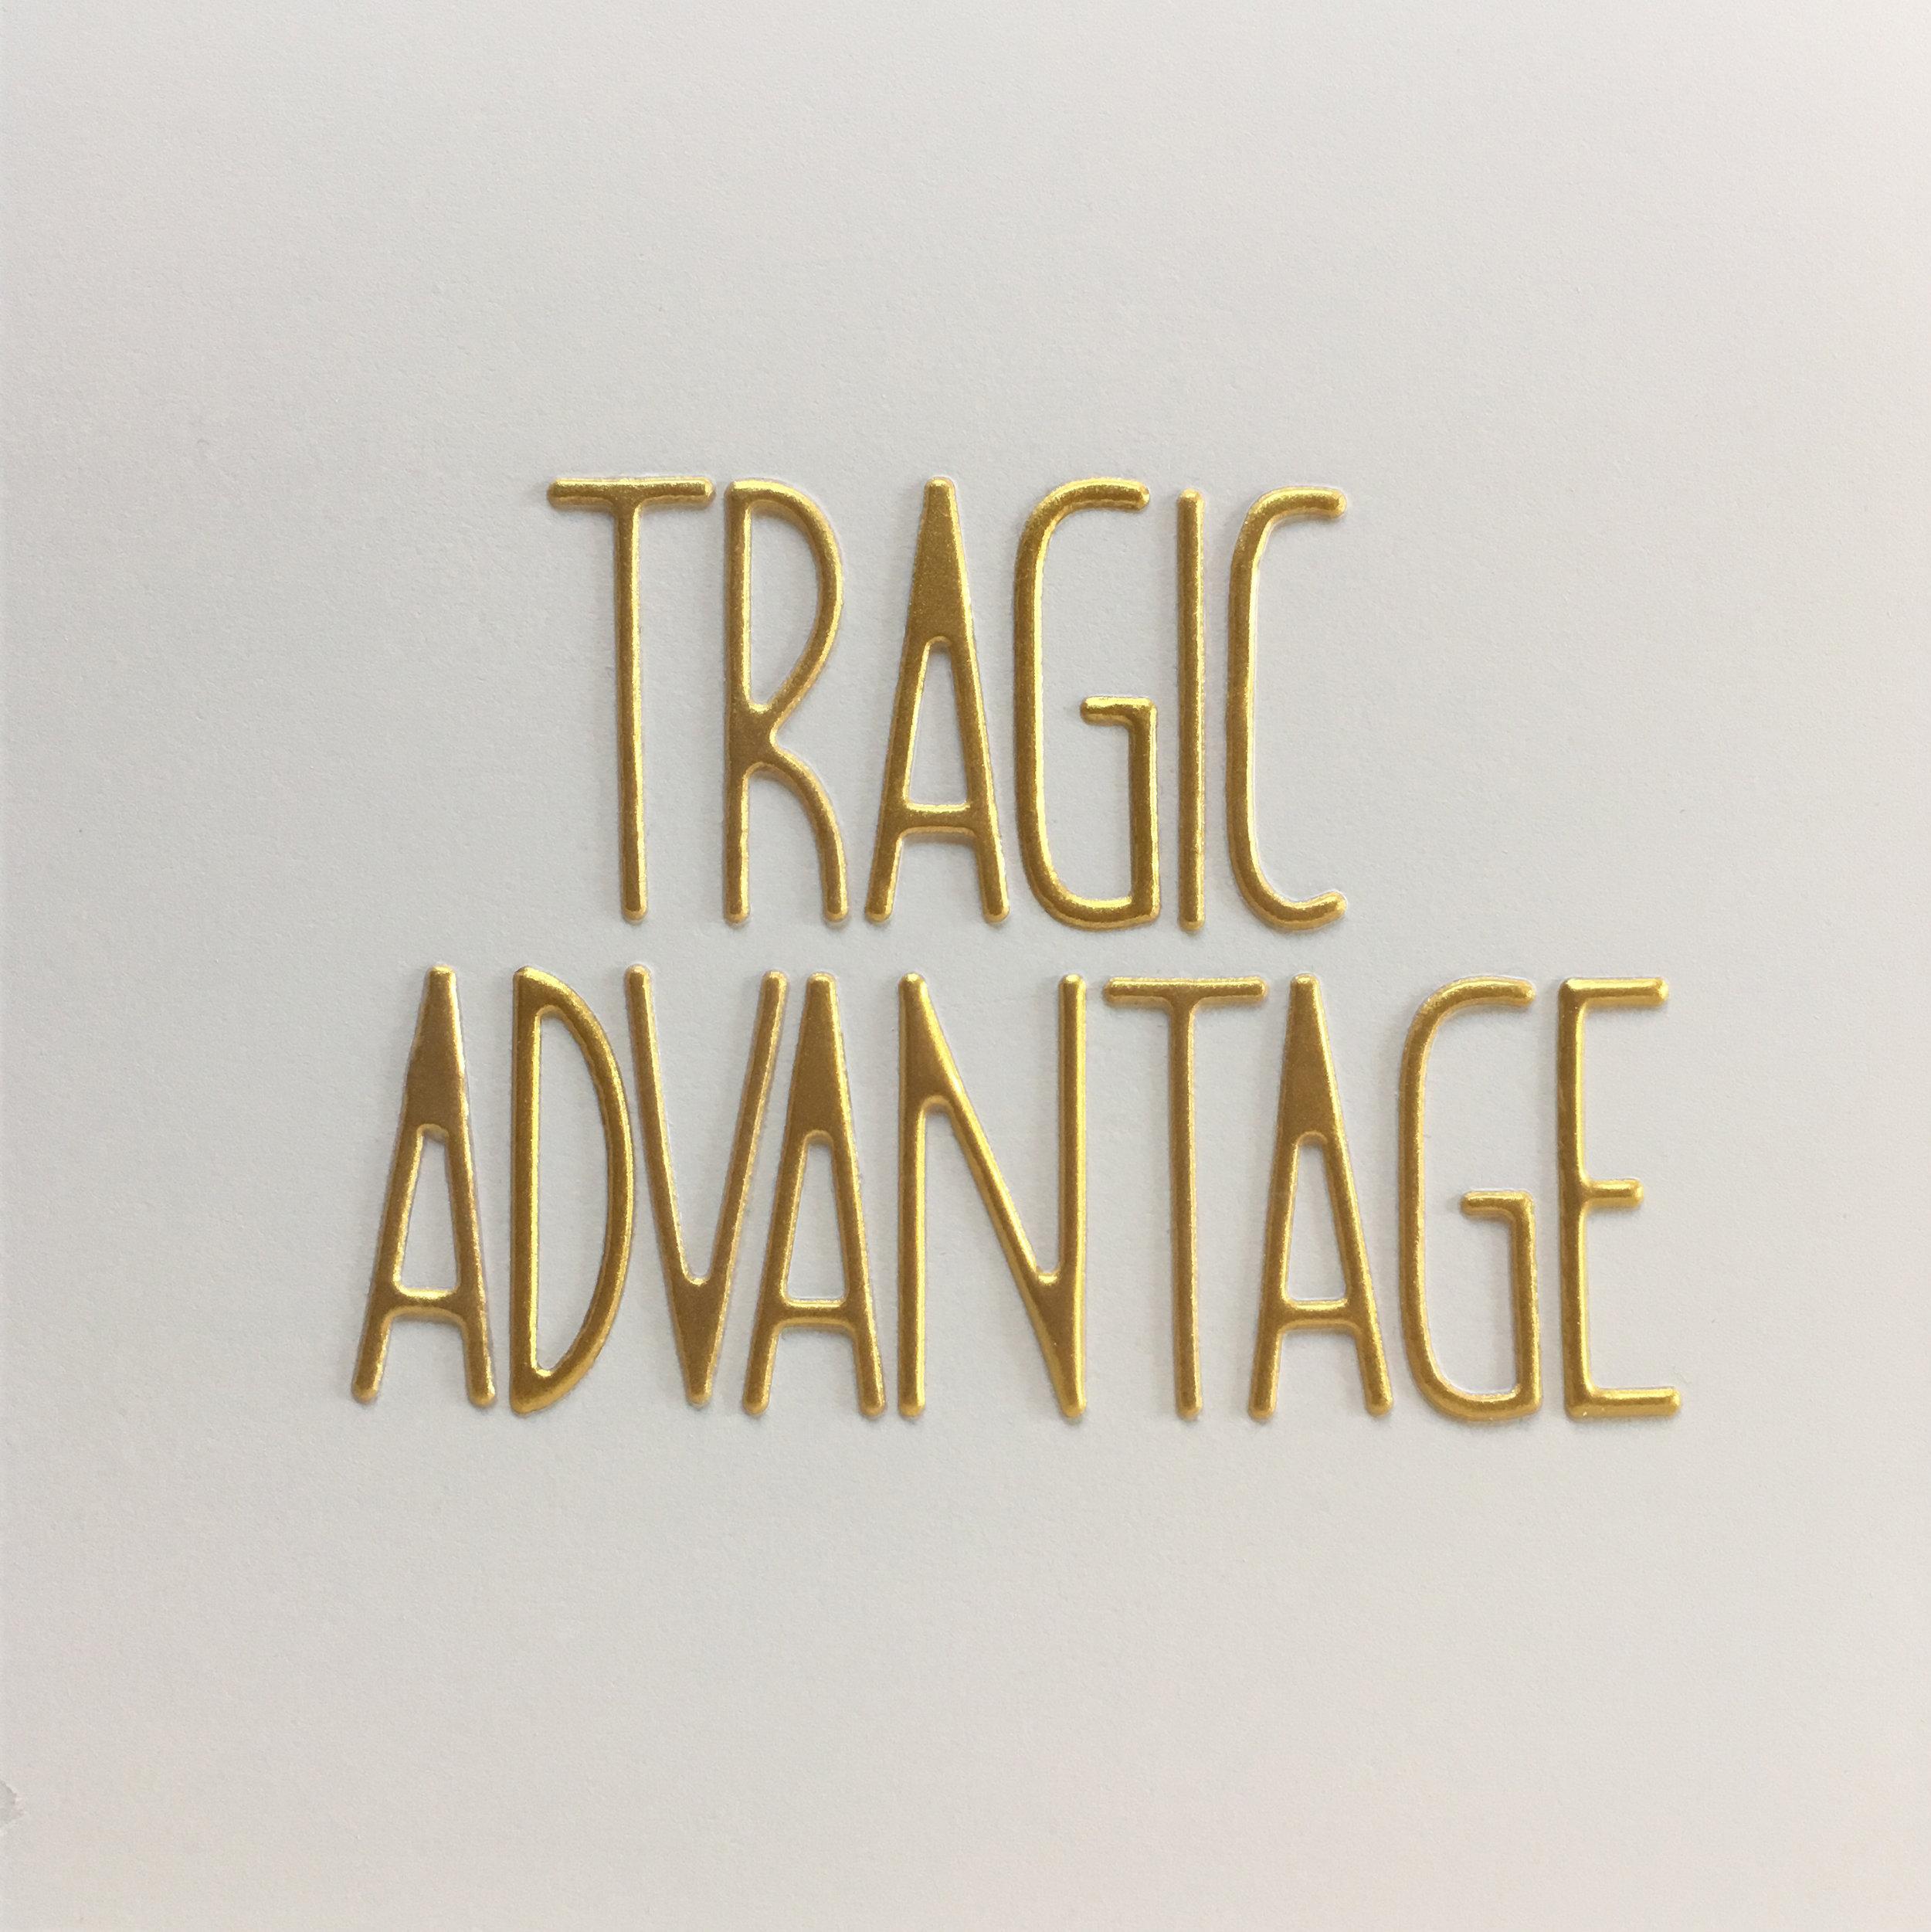 tragic advantage.jpg